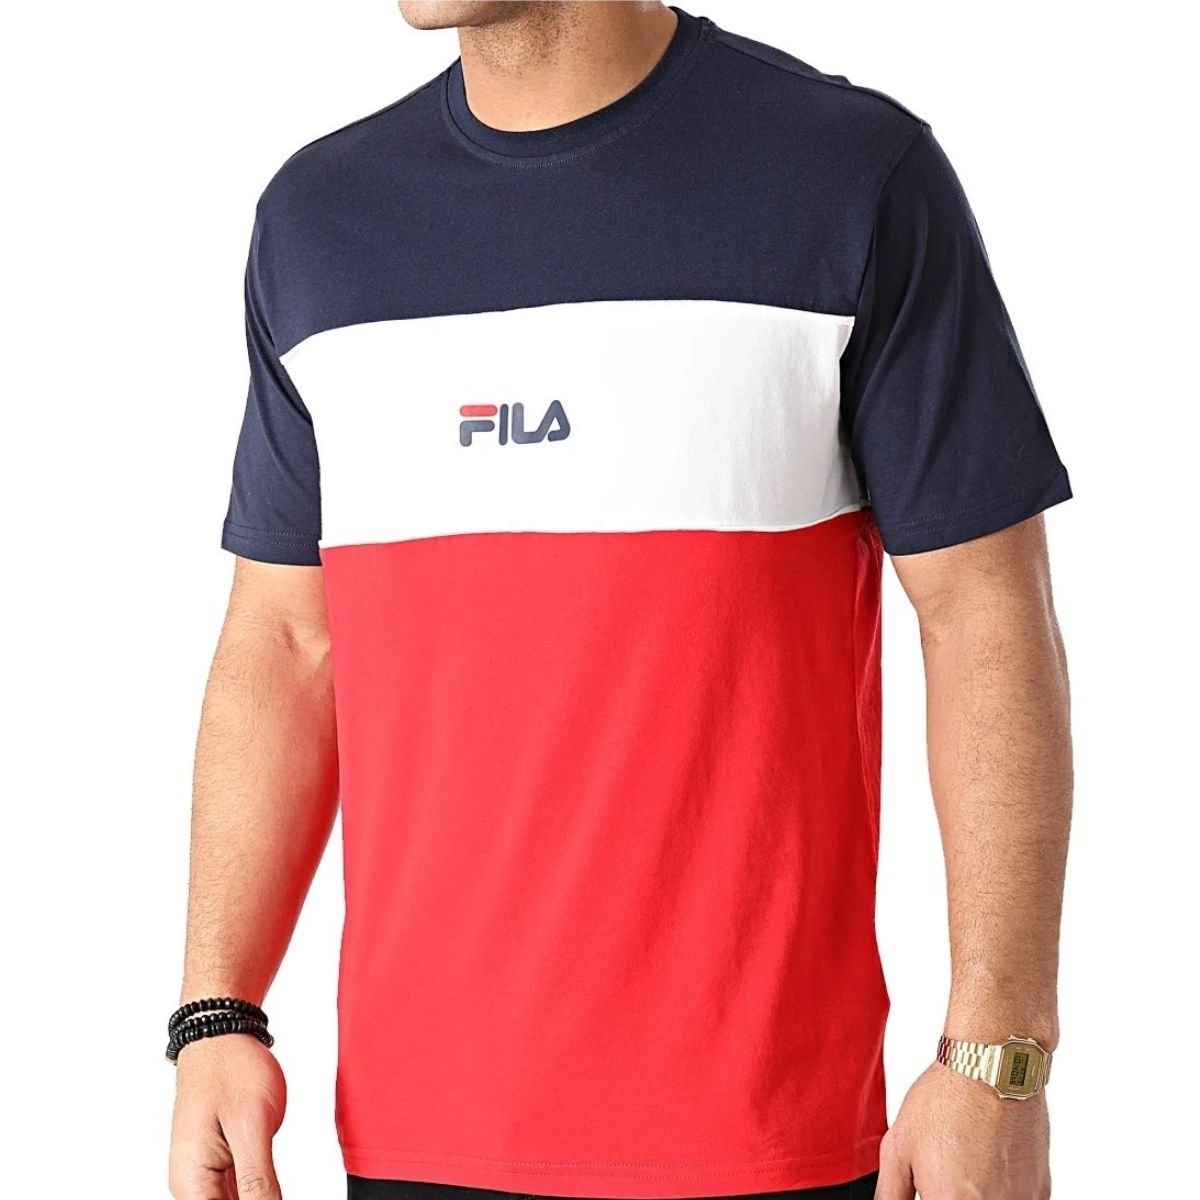 T-Shirt Fila Aniki Motivo...